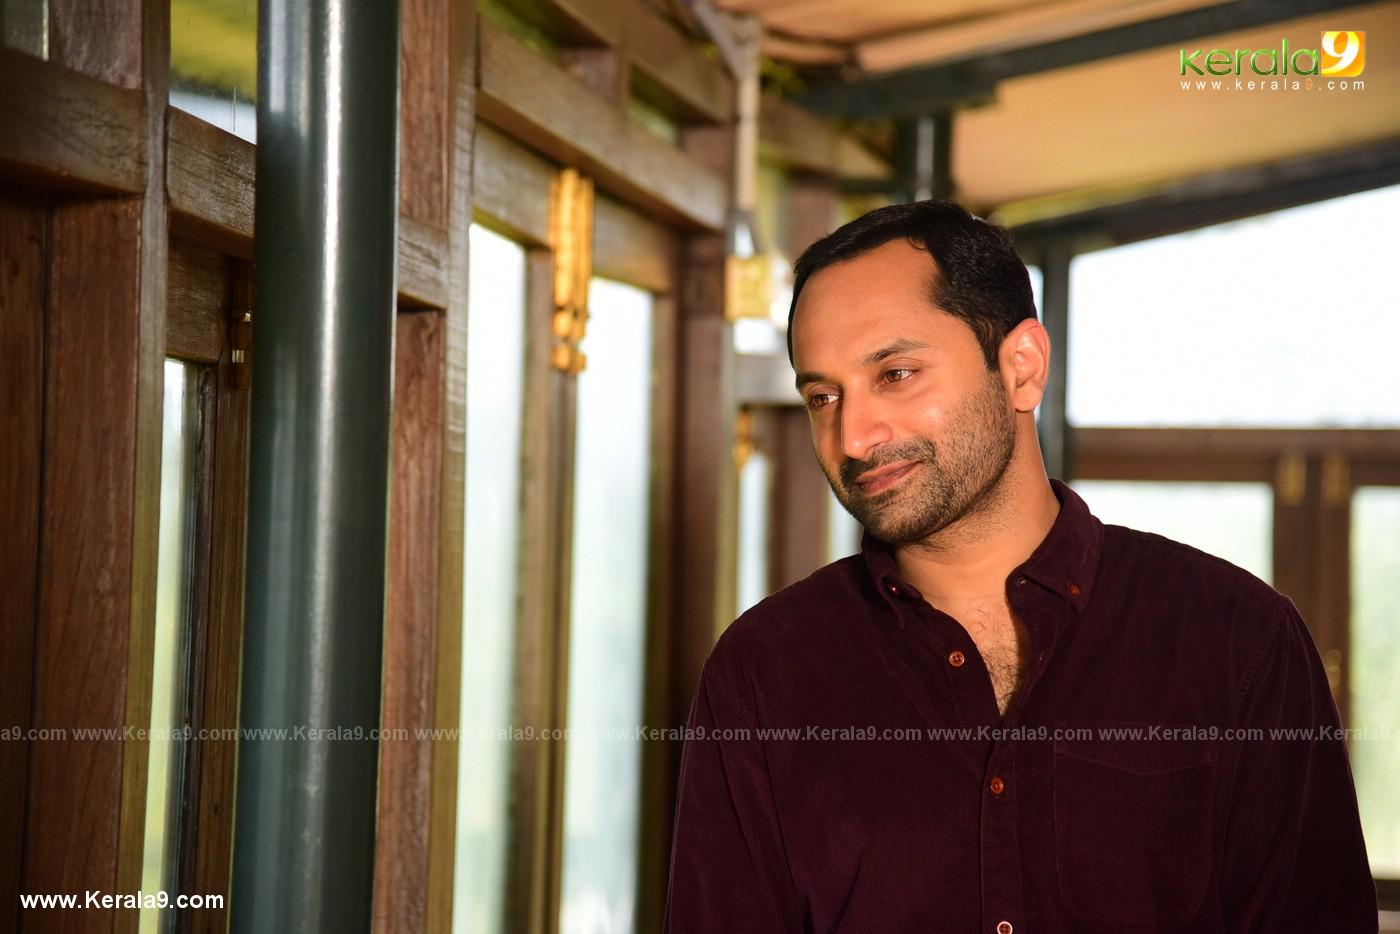 athiran malayalam movie stills 3 - Kerala9.com